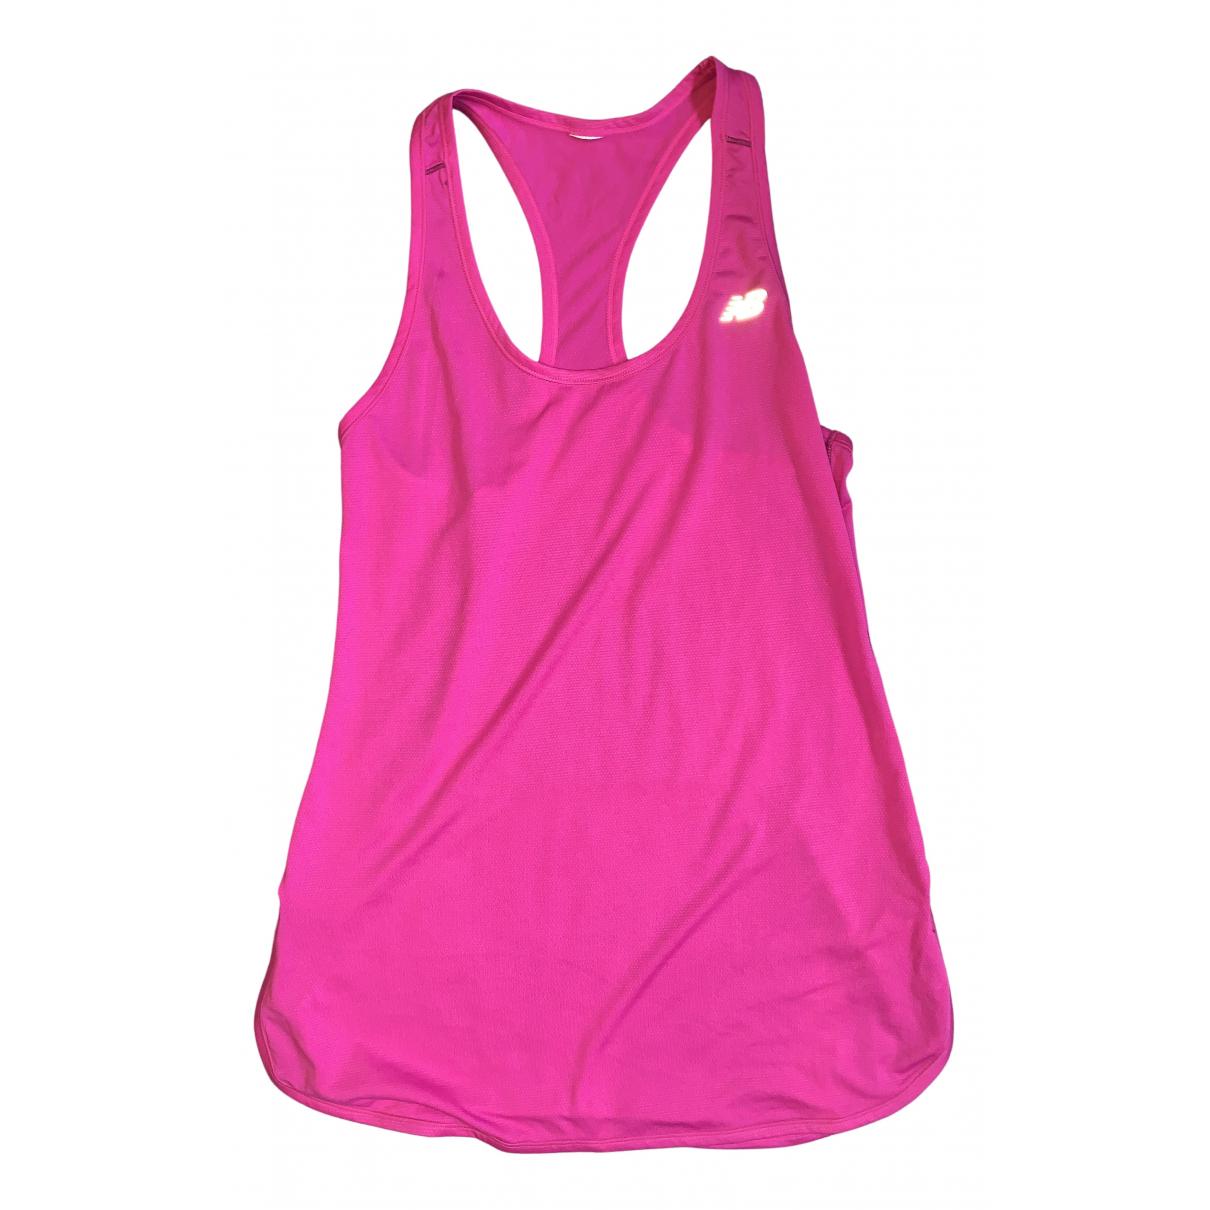 New Balance - Top   pour femme - rose